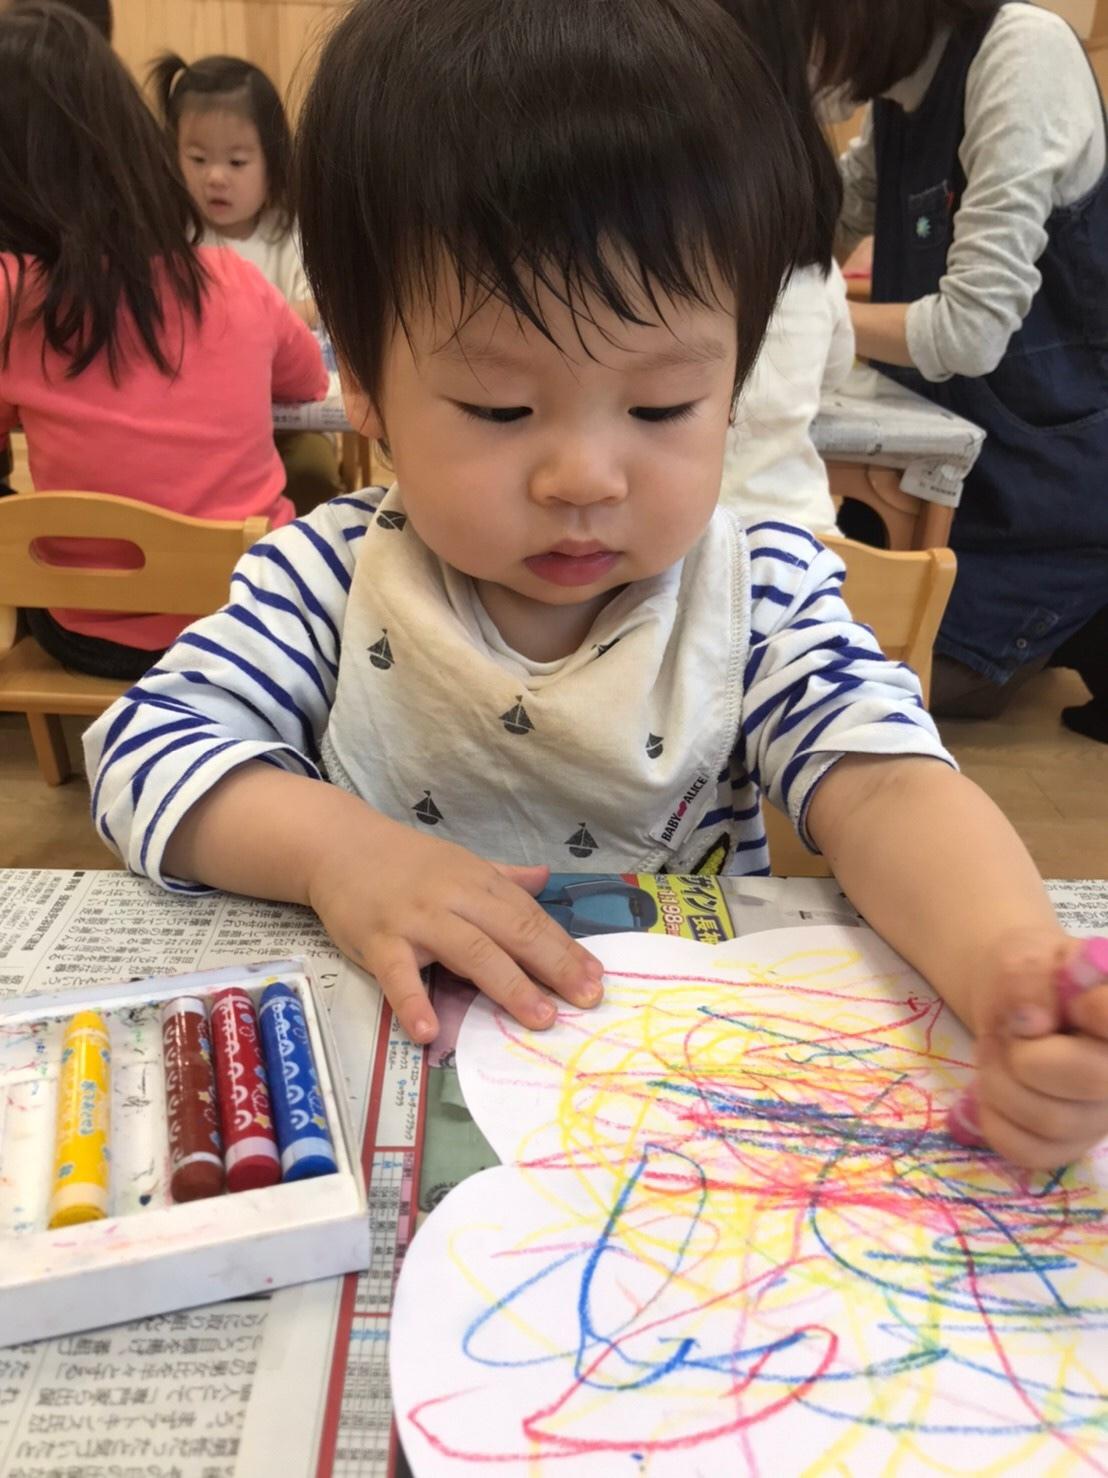 新百合ヶ丘ルーム〜自由画〜_a0318871_22133751.jpeg